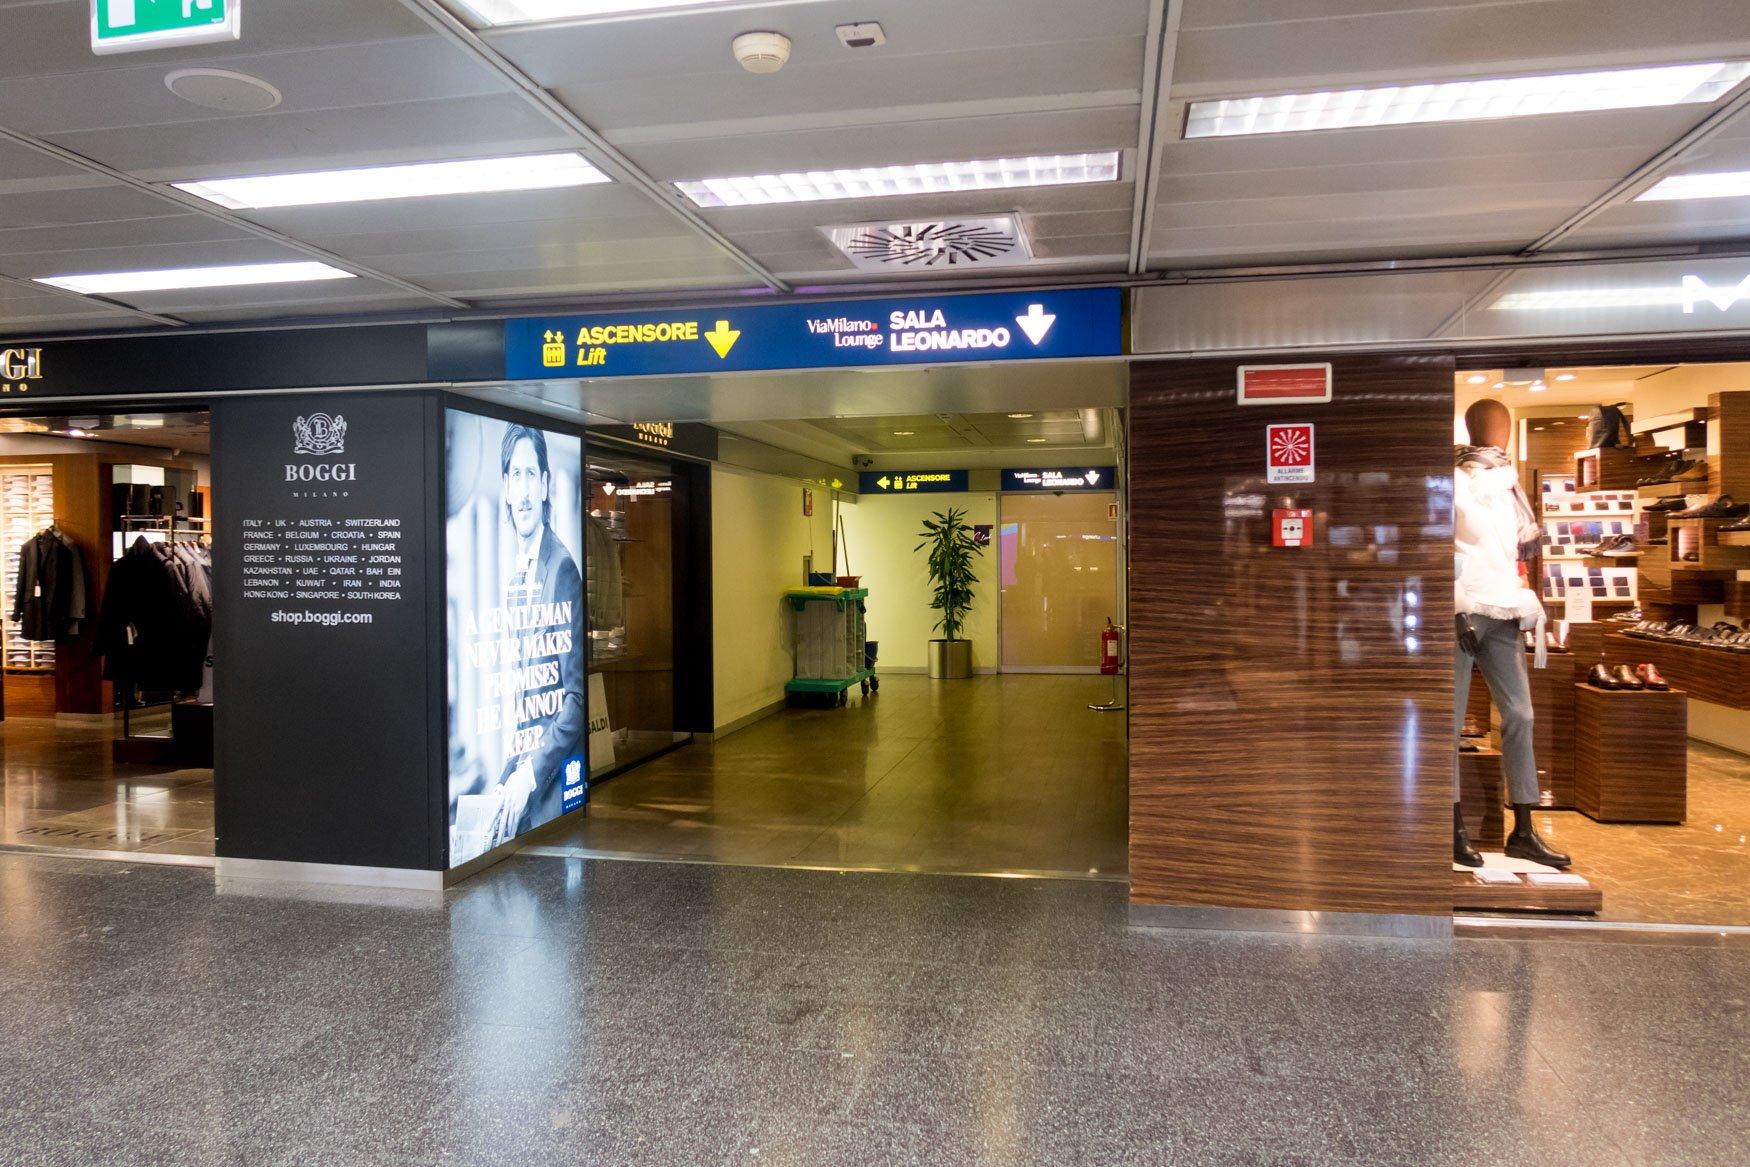 Club S.E.A. Sala Leonardo Milan Linate Entrance